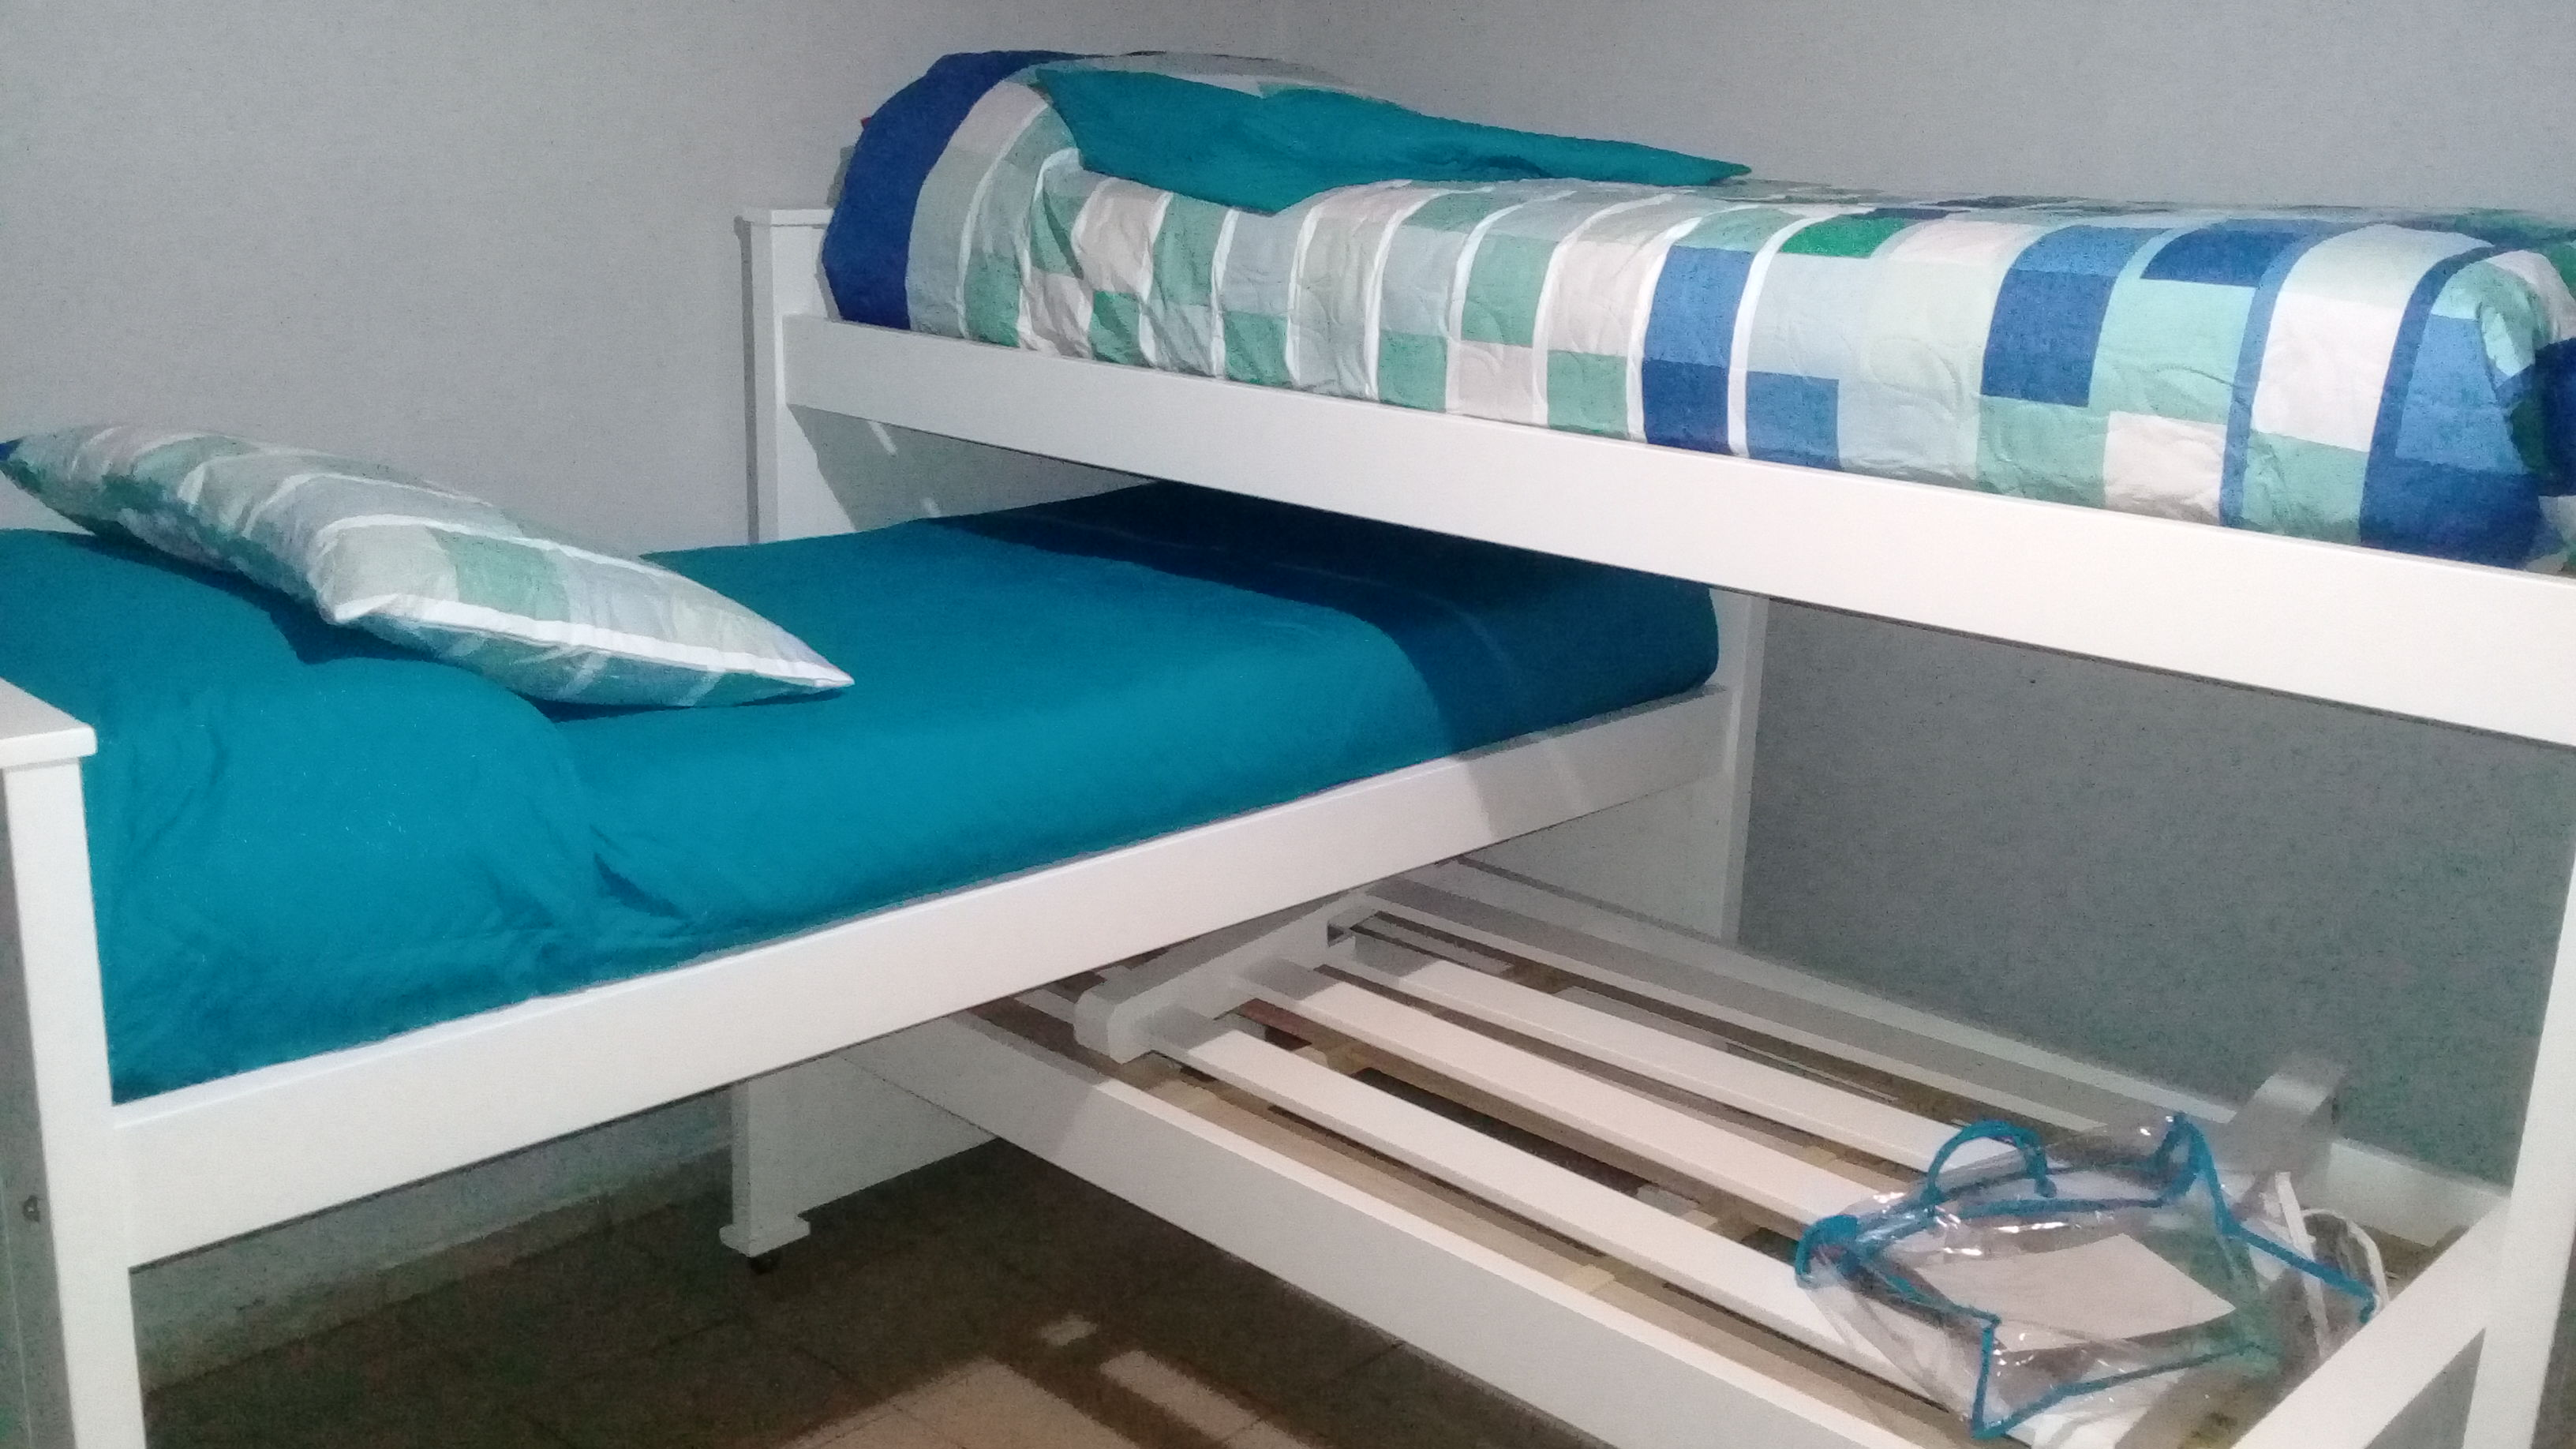 Muebles Infantiles - Camas Nido - 3 Camas Laqueadas